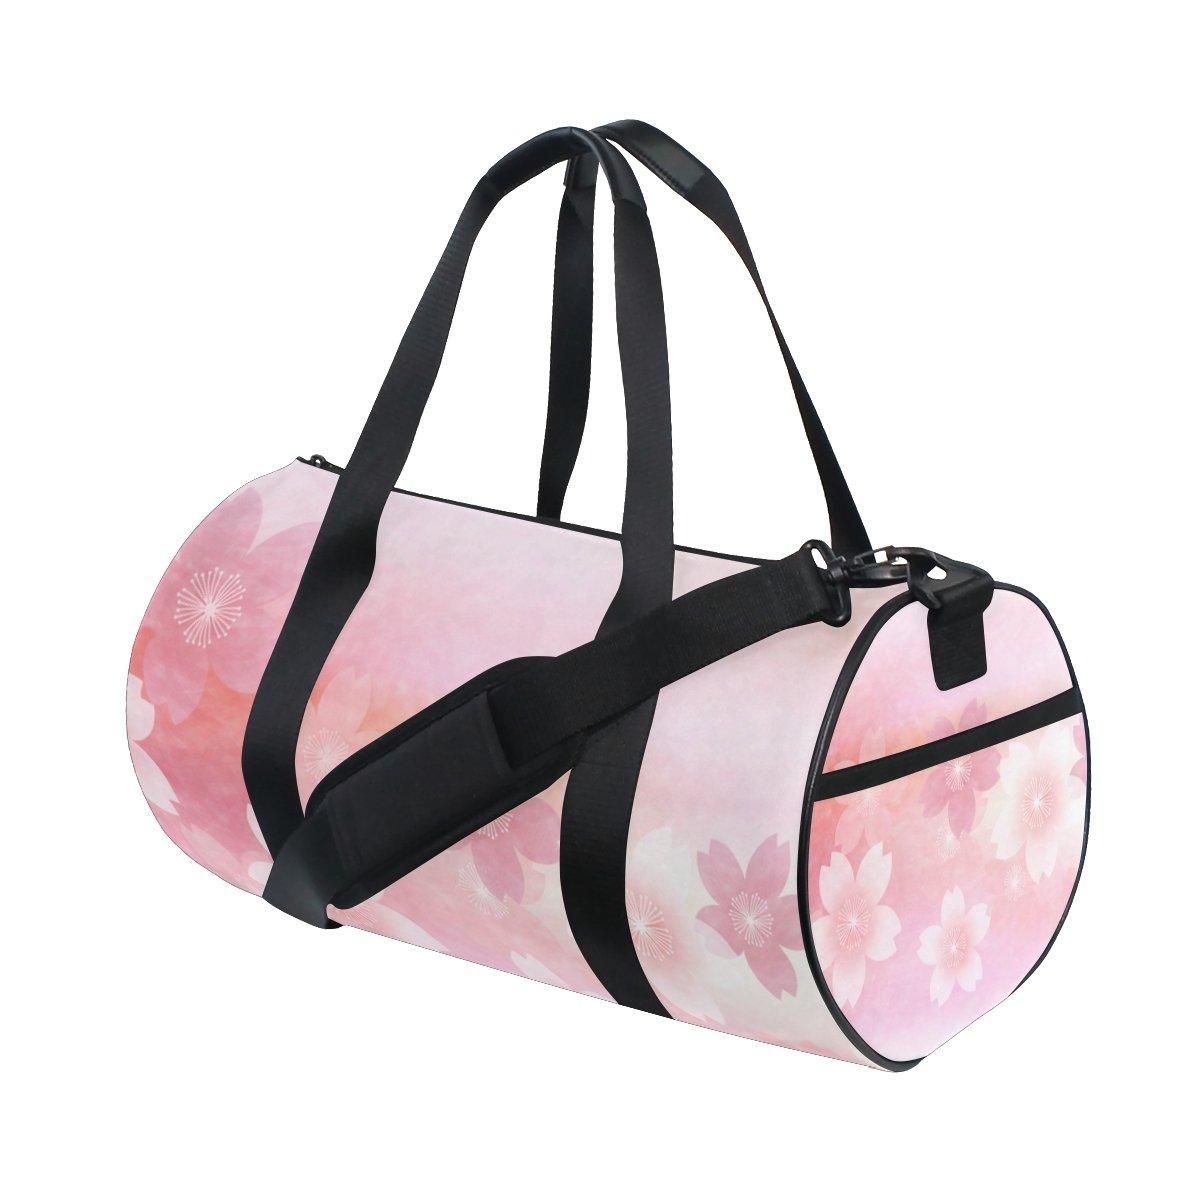 U LIFE Summer Spring Floral Flowers Elegant Sports Gym Shoulder Handy Duffel Bags for Women Men Kids Boys Girls